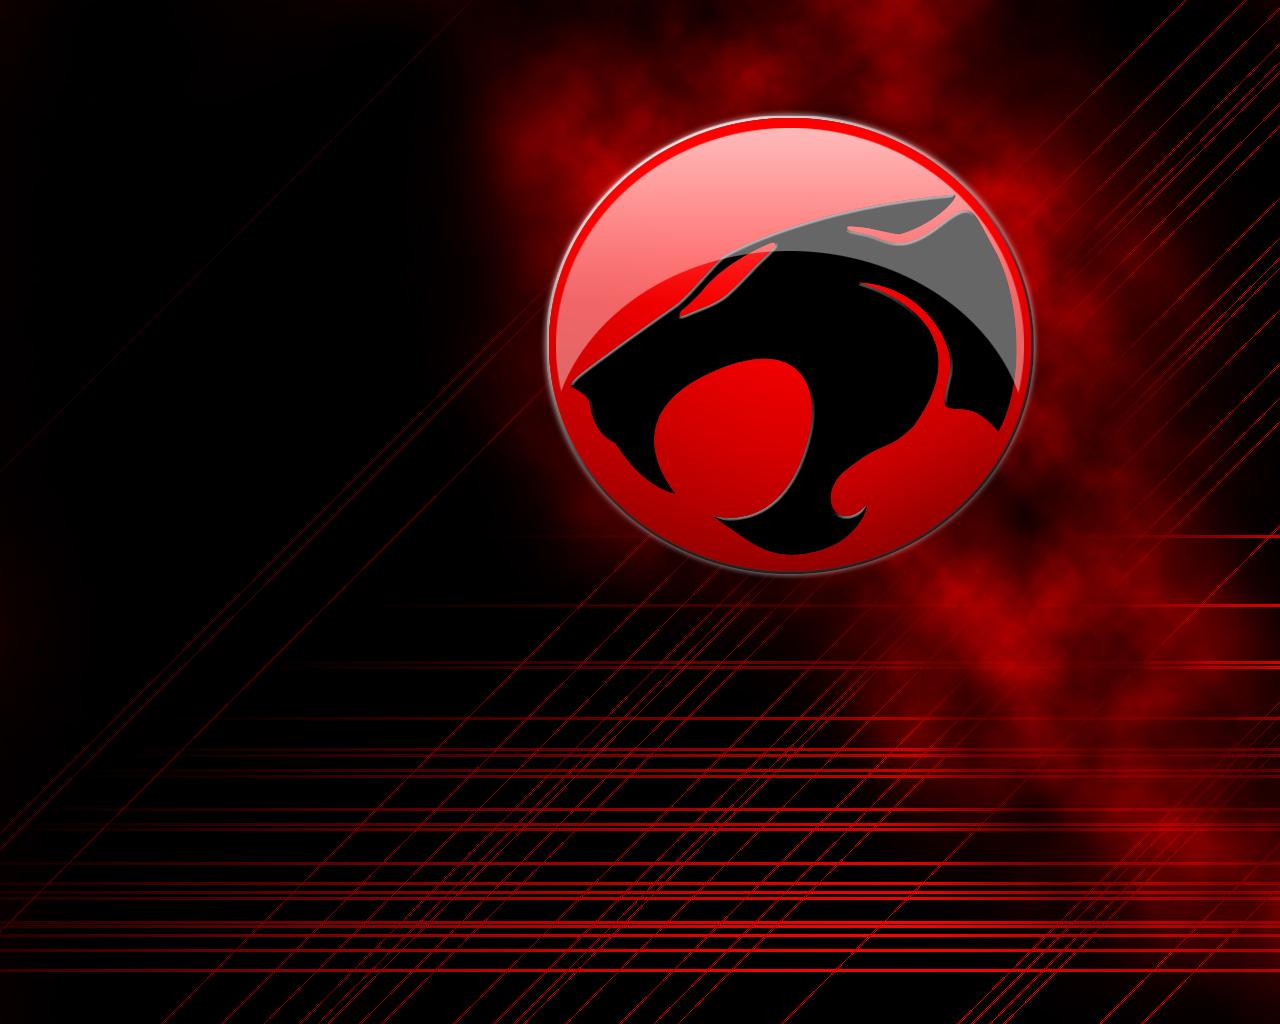 Thundercats Wallpaper HD wallpaper   Red Logo Thundercats Wallpaper 1280x1024